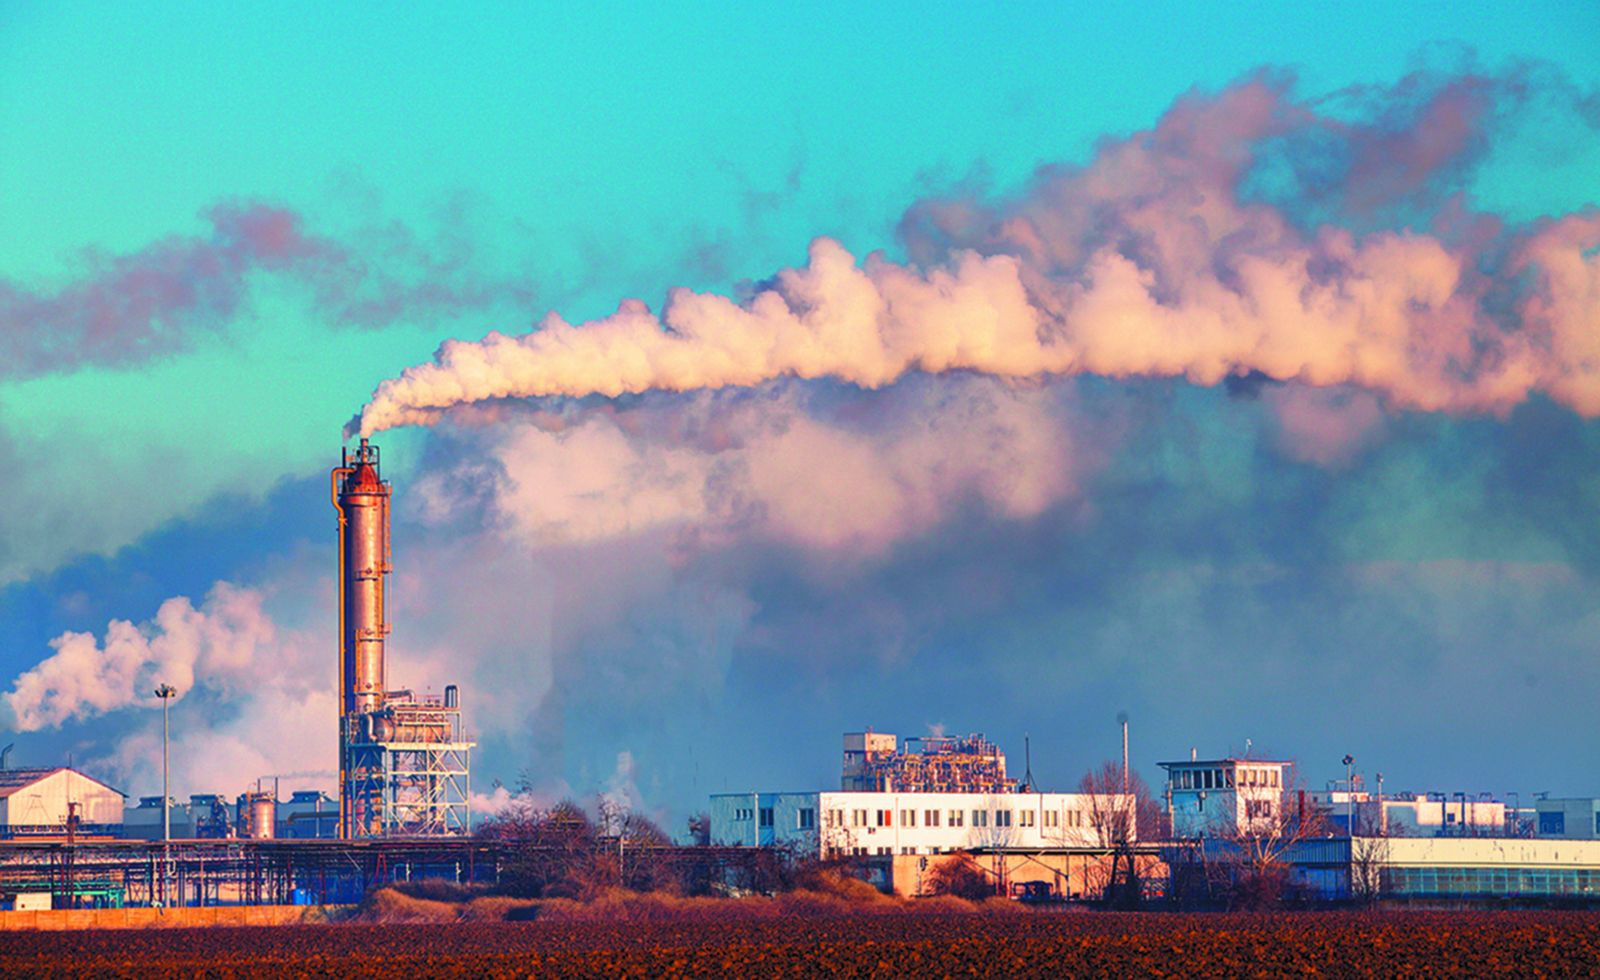 वायु प्रदूषण कारण दुष्प्रभाव बचाव,Air Pollution Causes Effects In Hindi, how to reduce Air Pollution in hindi, Air Pollution se bachav tarika